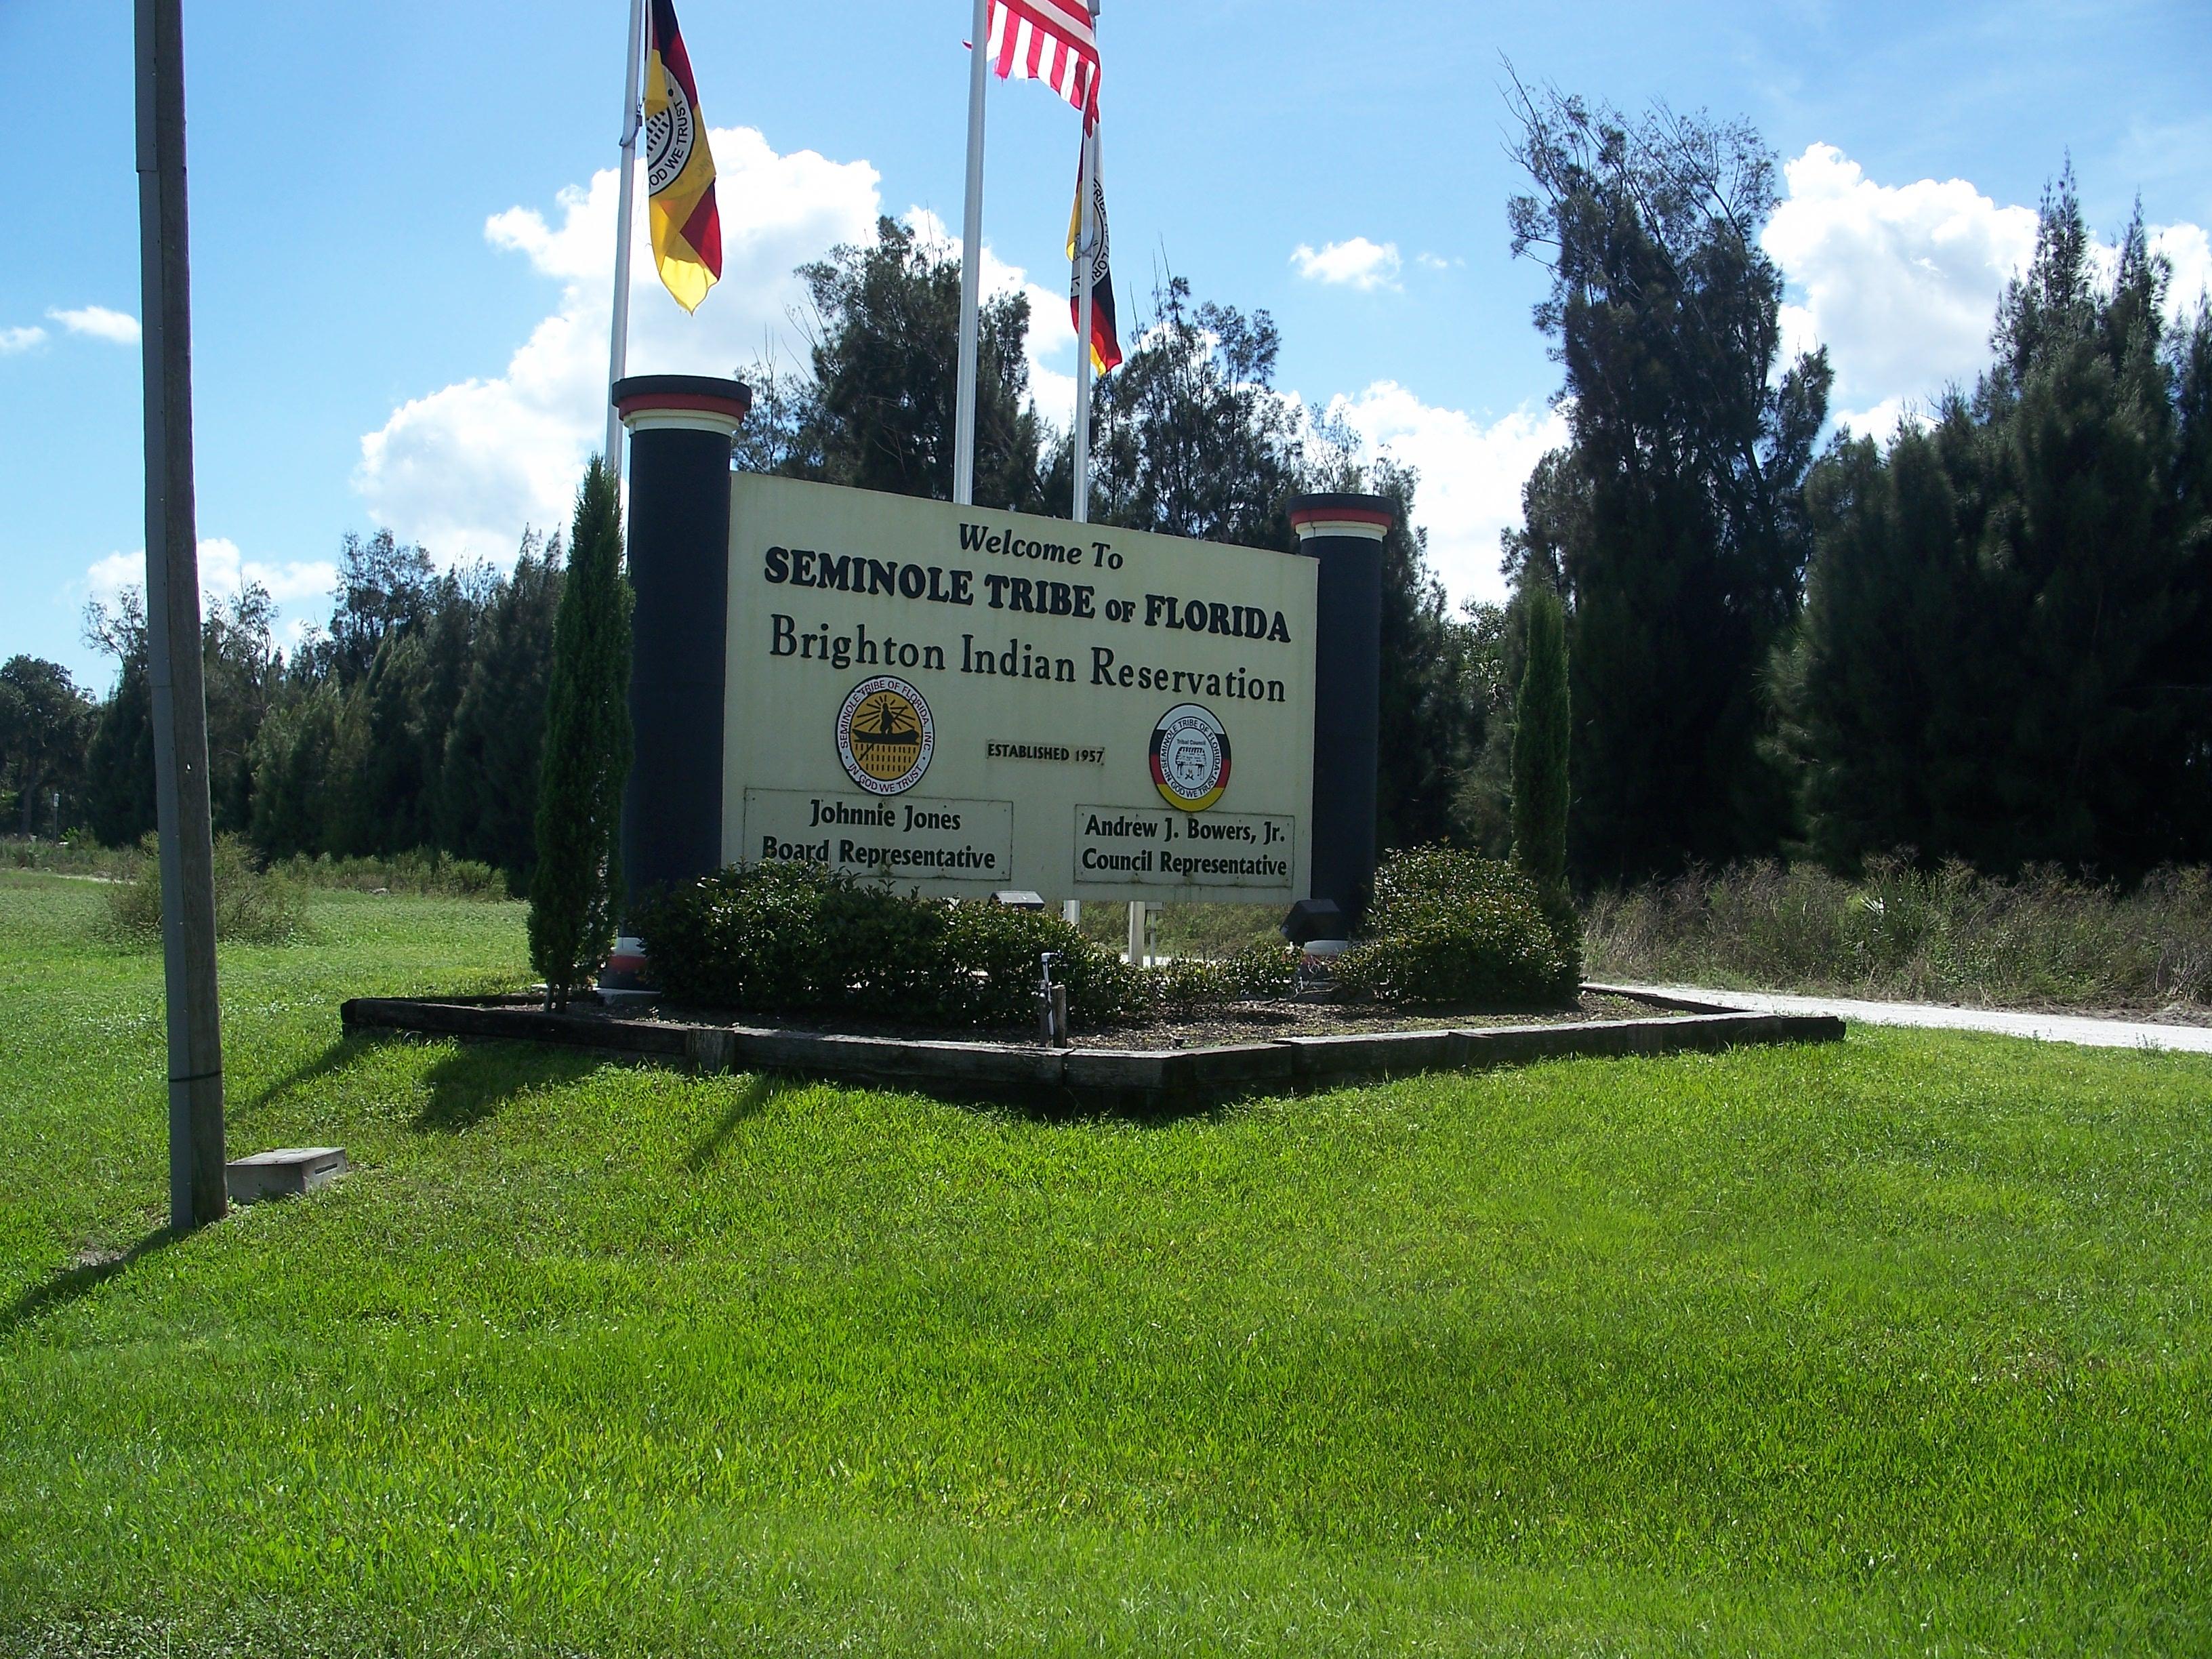 Florida seminole indians Governor Ron